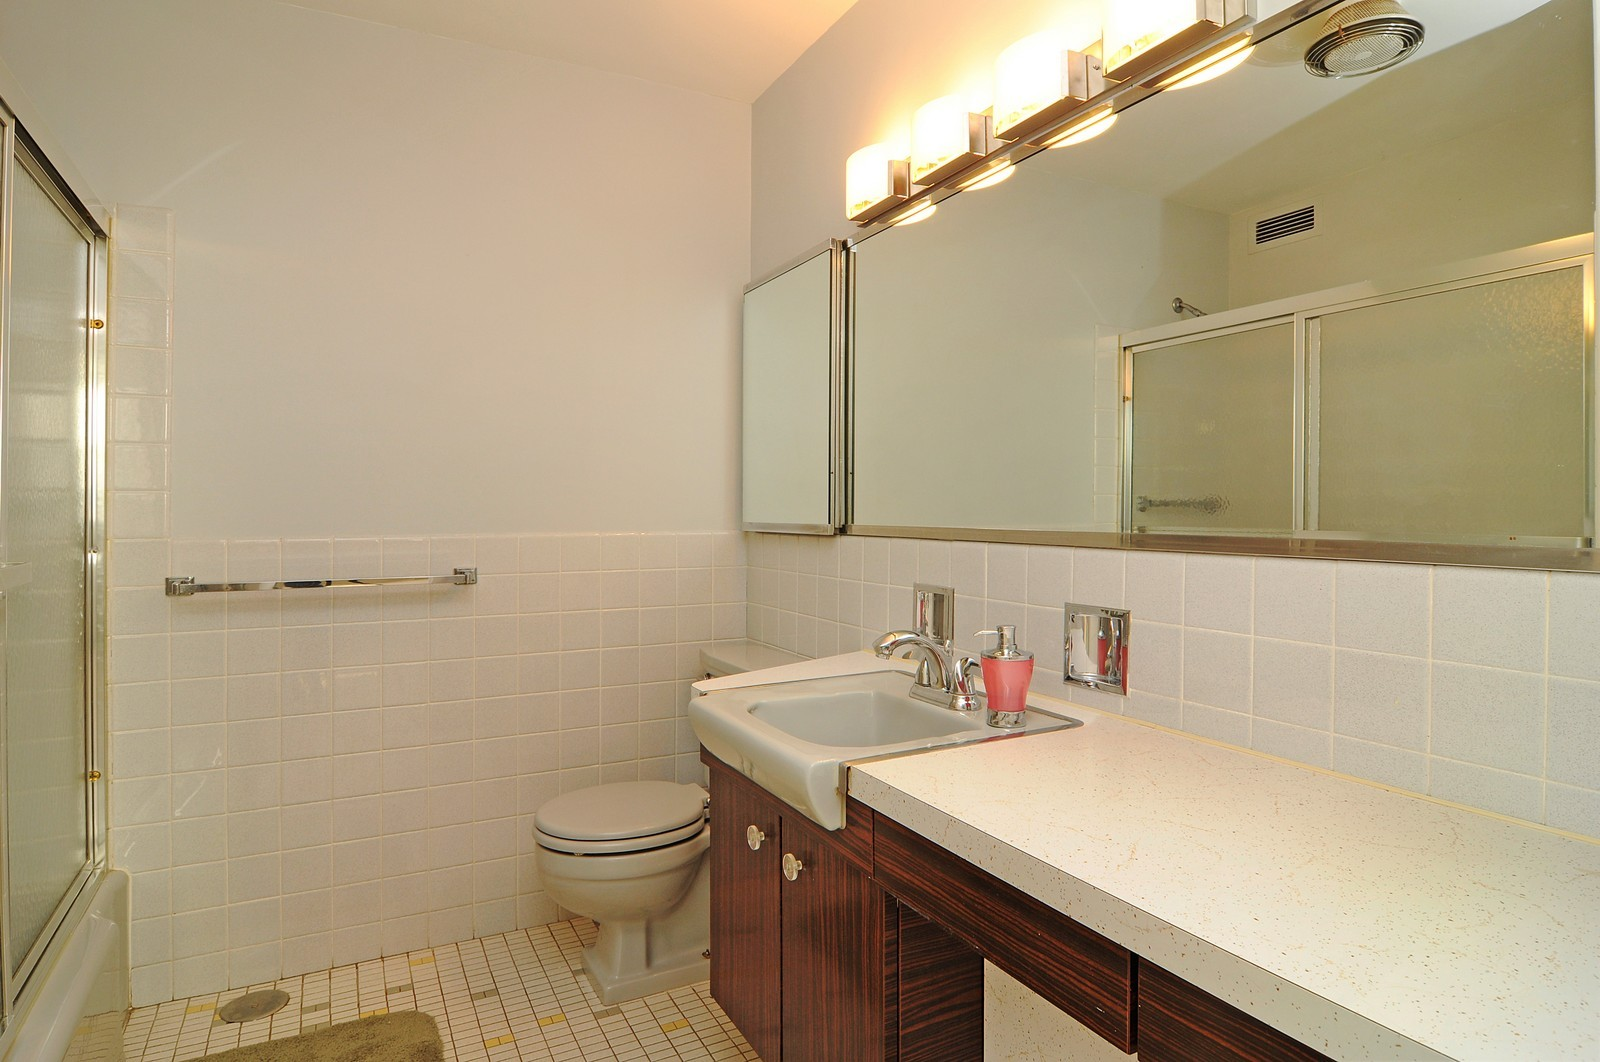 Real Estate Photography - 5701 N Sheridan, Unit 9J, Chicago, IL, 60660 - Master Bathroom